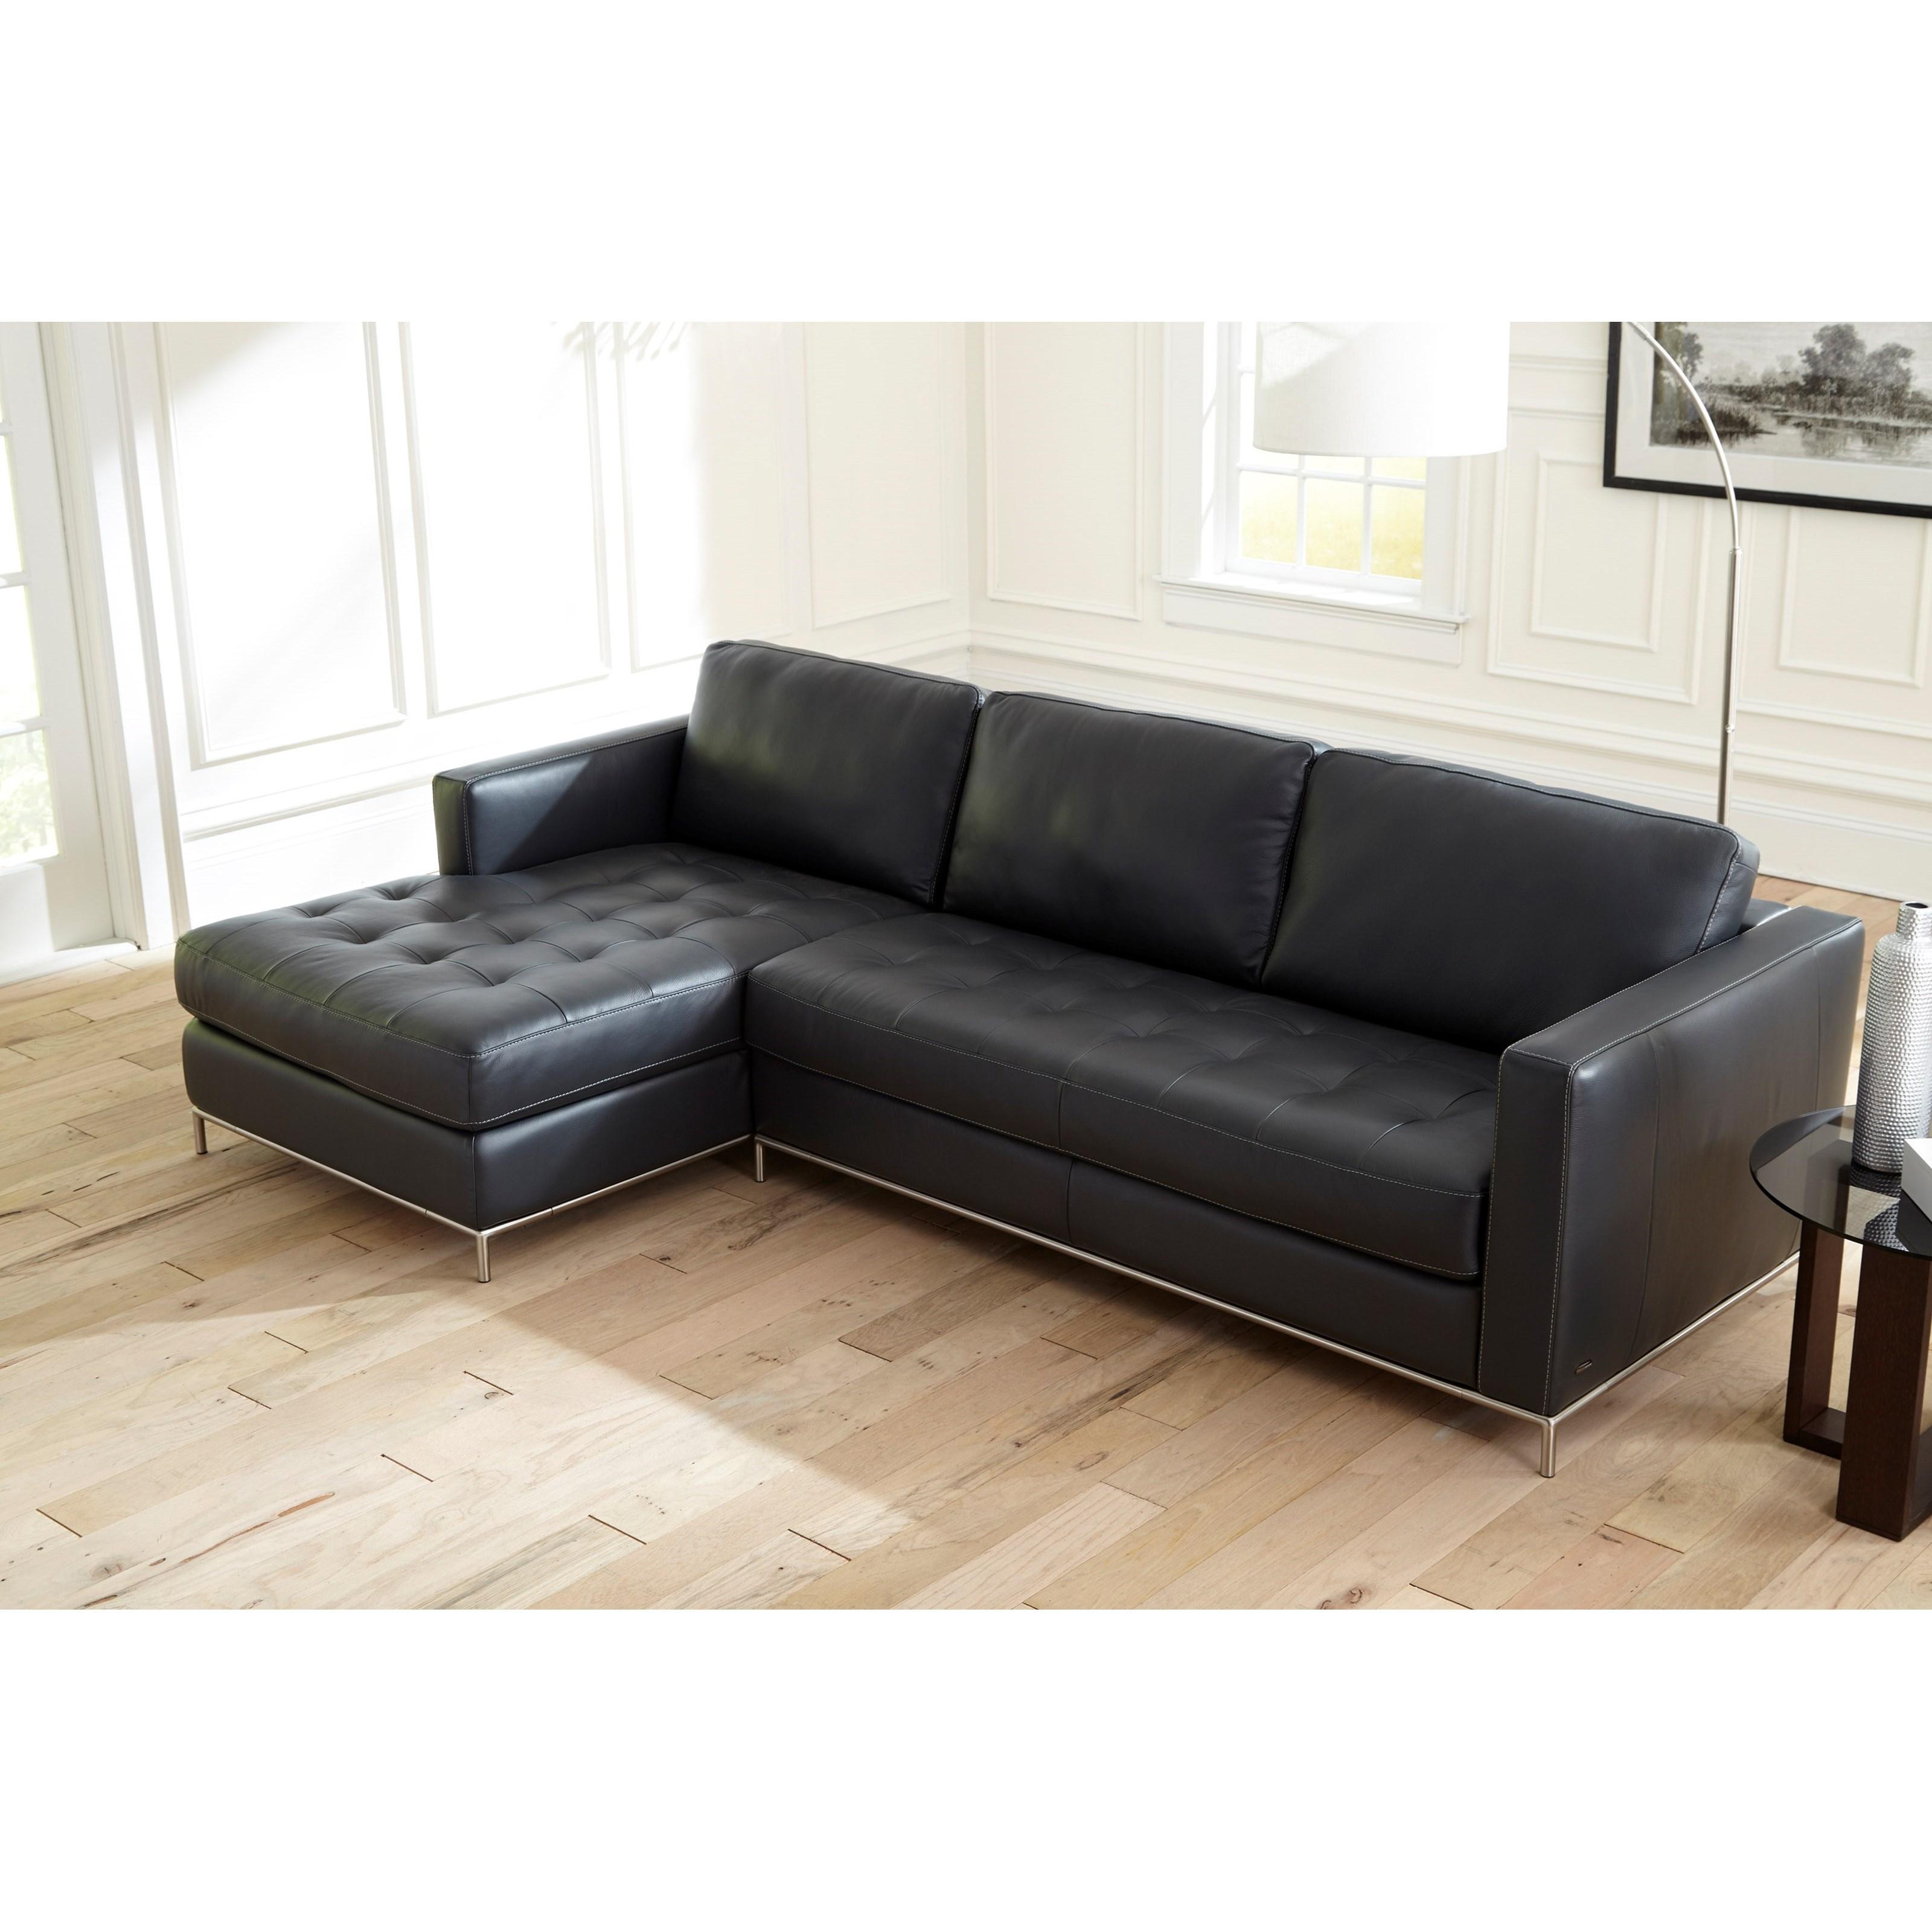 Superieur ... Natuzzi Editions B8052 Pc Sectional Sofa